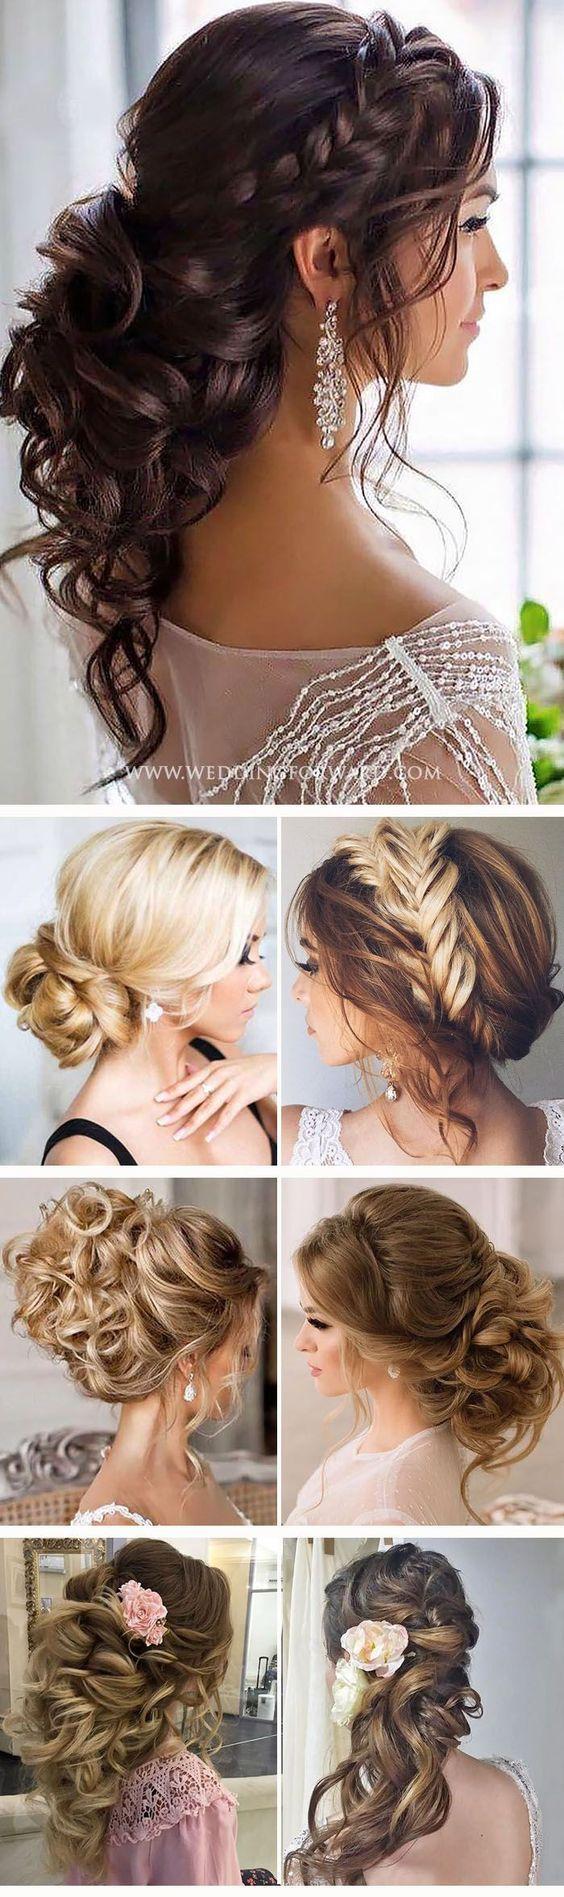 unique wedding hairstyles ideas